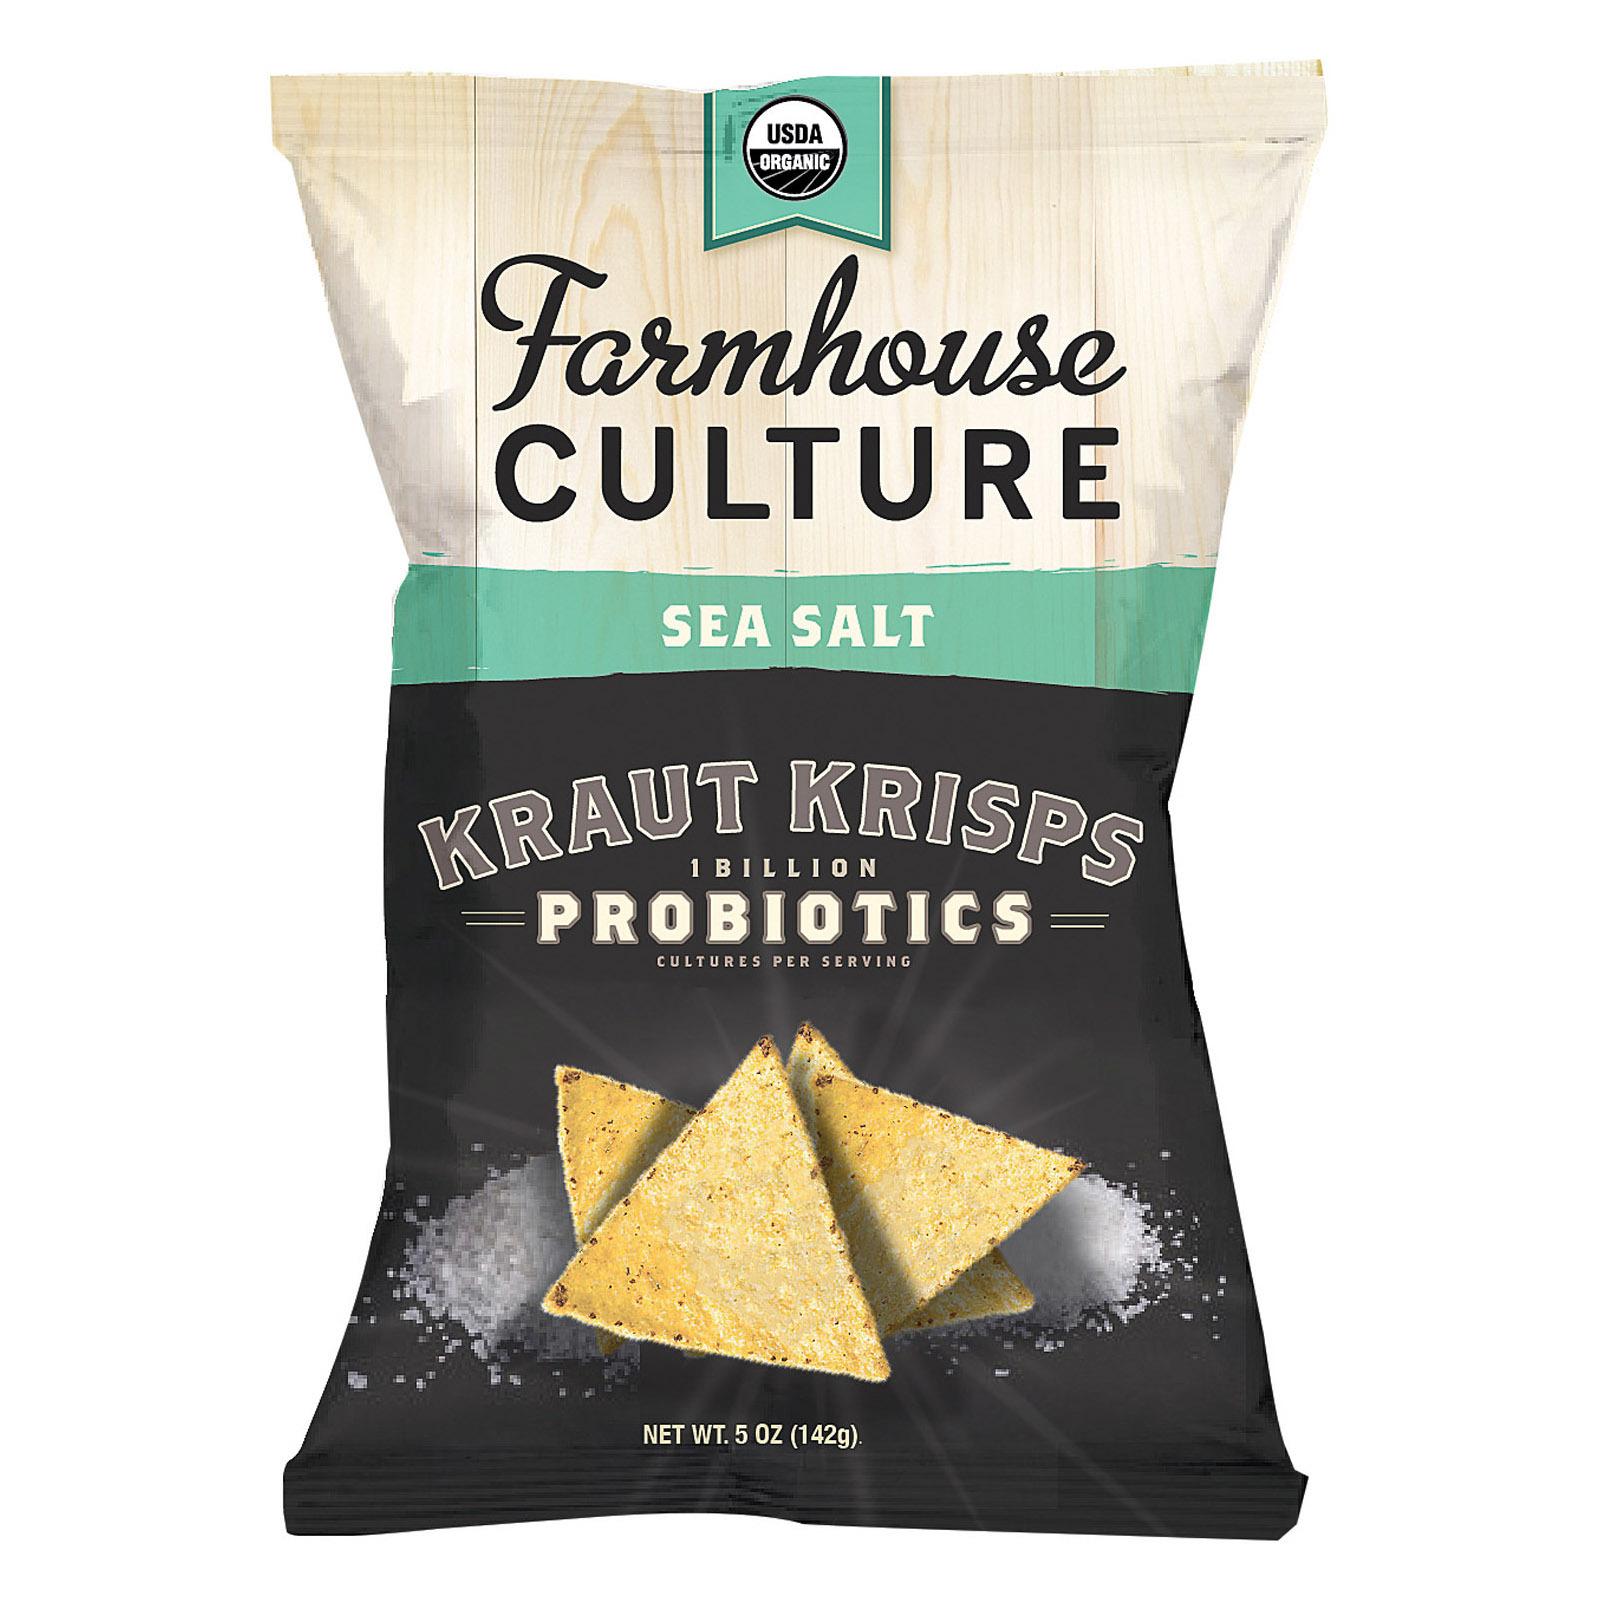 Farmhouse Culture Organic Probiotic Kraut Krisps - Sea Salt - Case of 12 - 5 oz